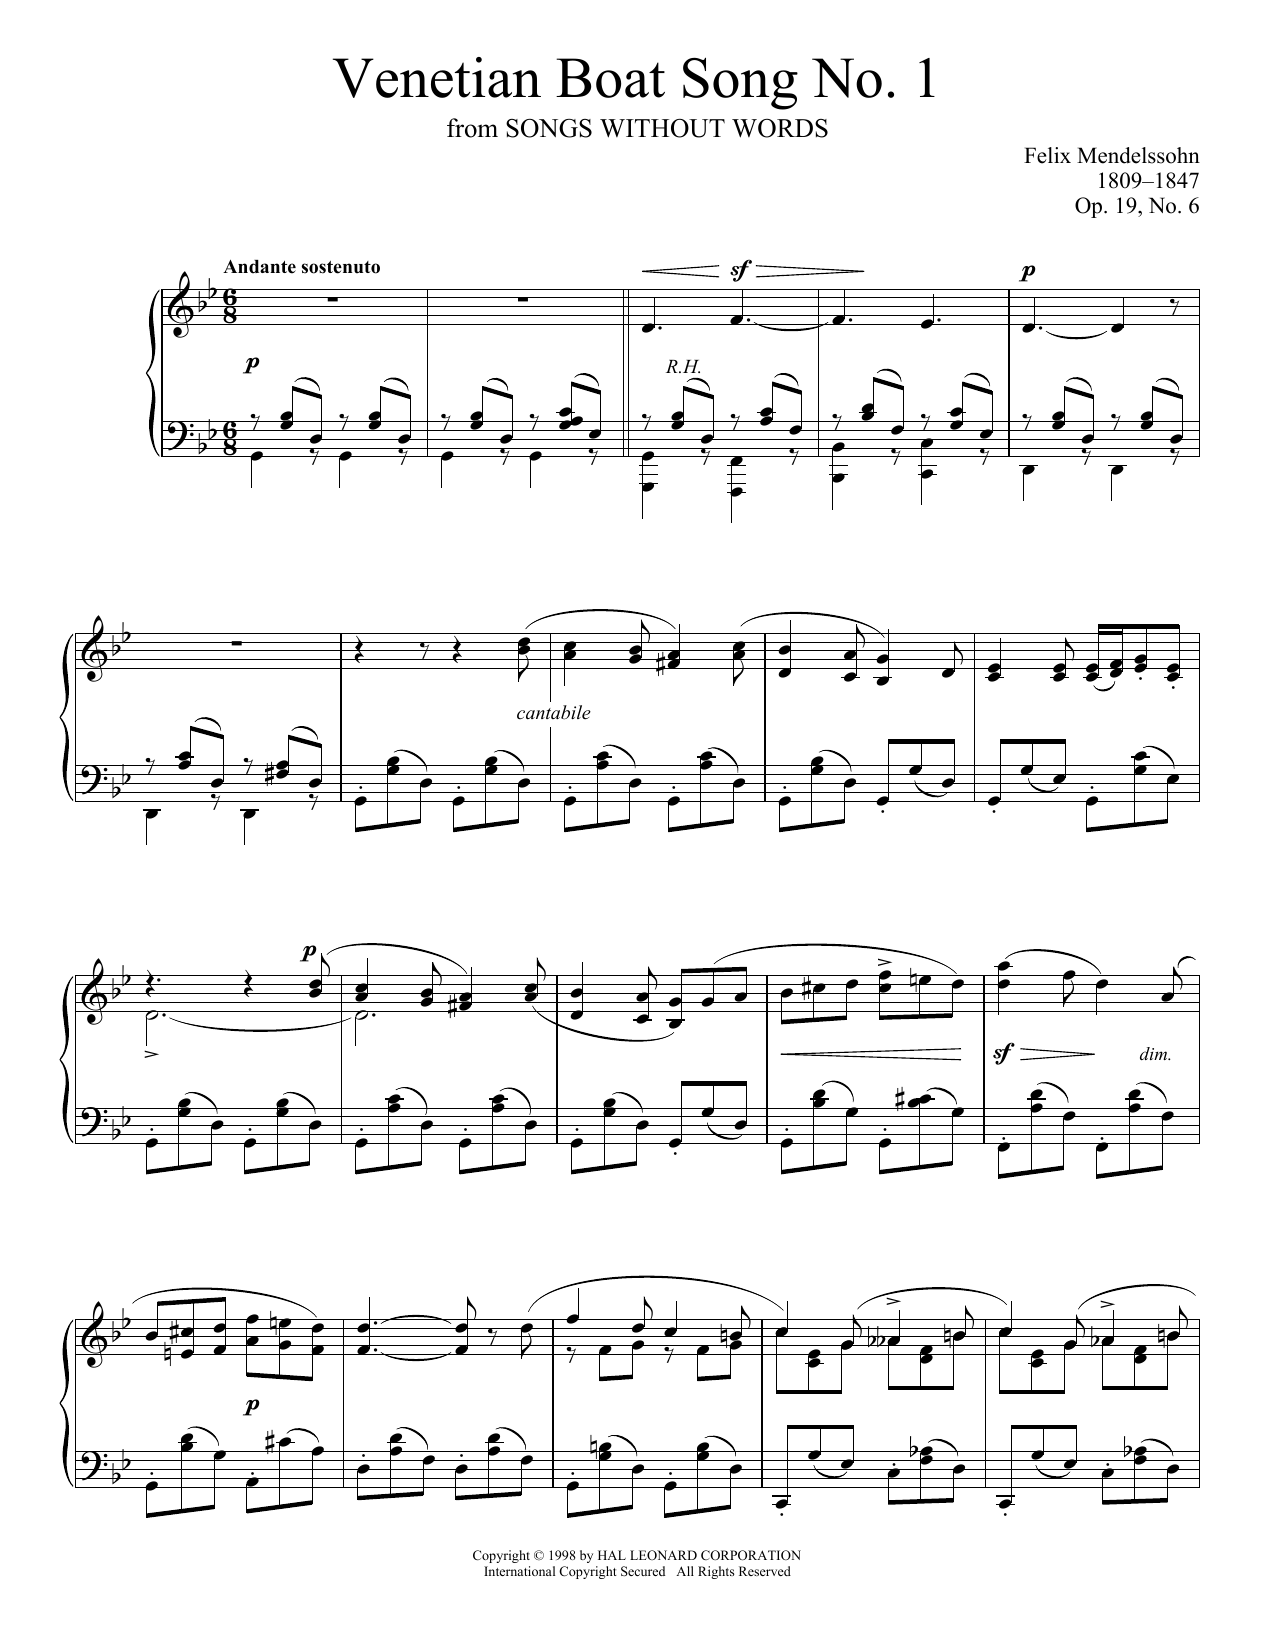 Venetian Boat Song No. 1, Op. 19, No. 6 (Piano Solo)